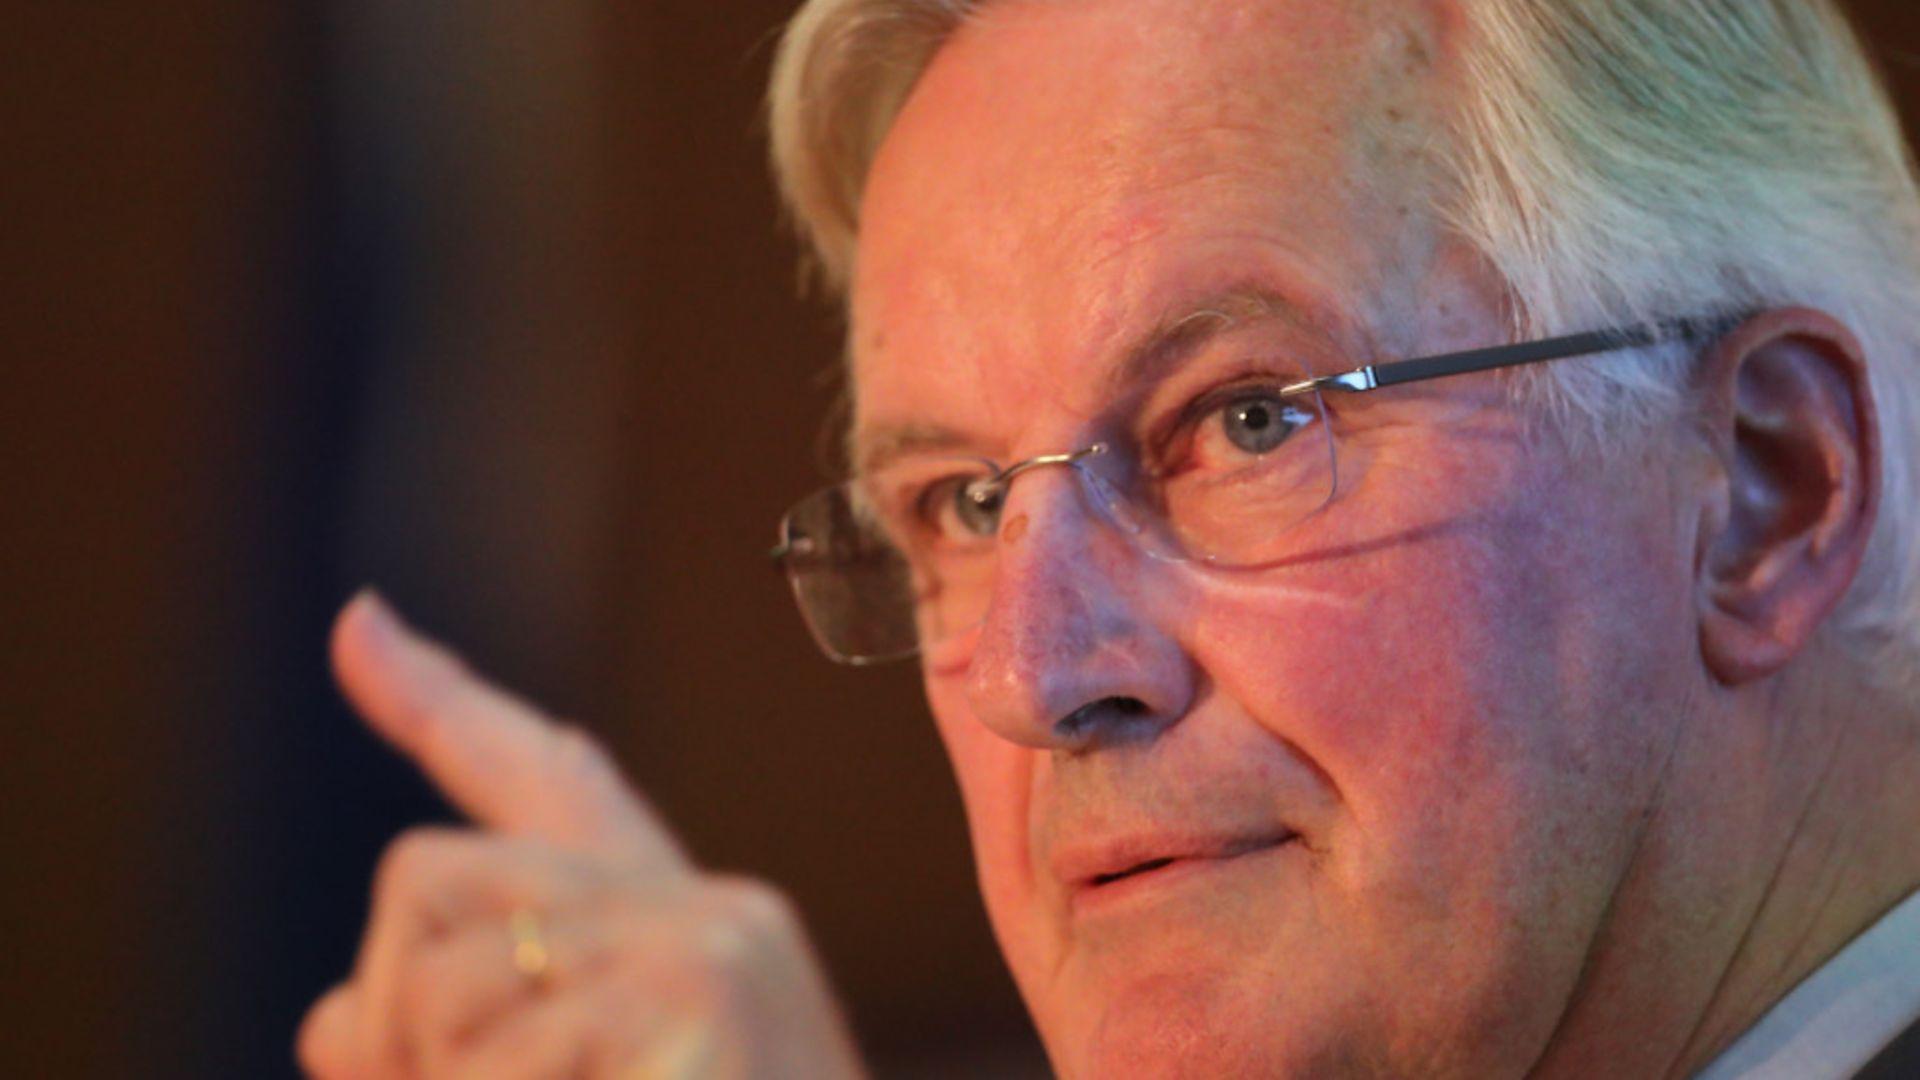 Michel Barnier, the EU's former  Brexit negotiator, speaking at Queen's University in Belfast - Credit: Liam McBurney/PA